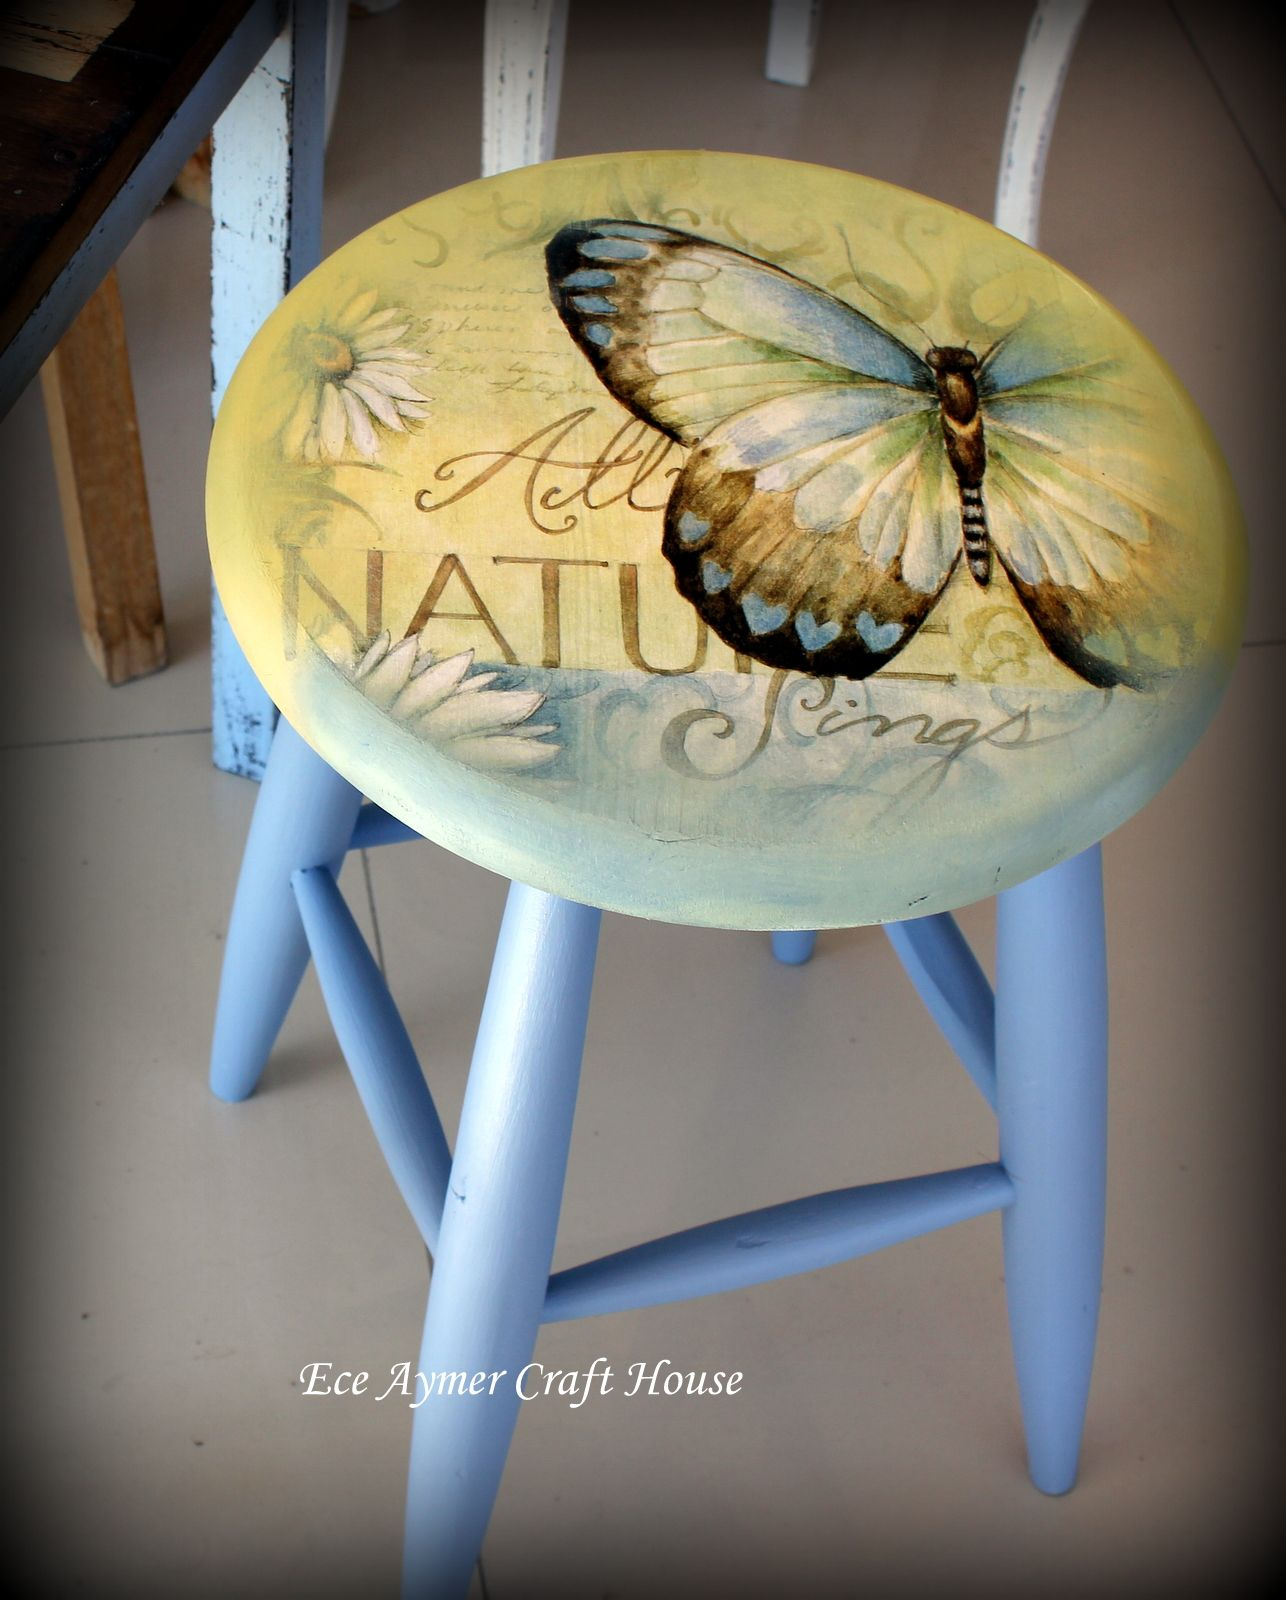 ece aymer craft house ayyolu ankara pinterest m bel stuhl und bunte m bel. Black Bedroom Furniture Sets. Home Design Ideas